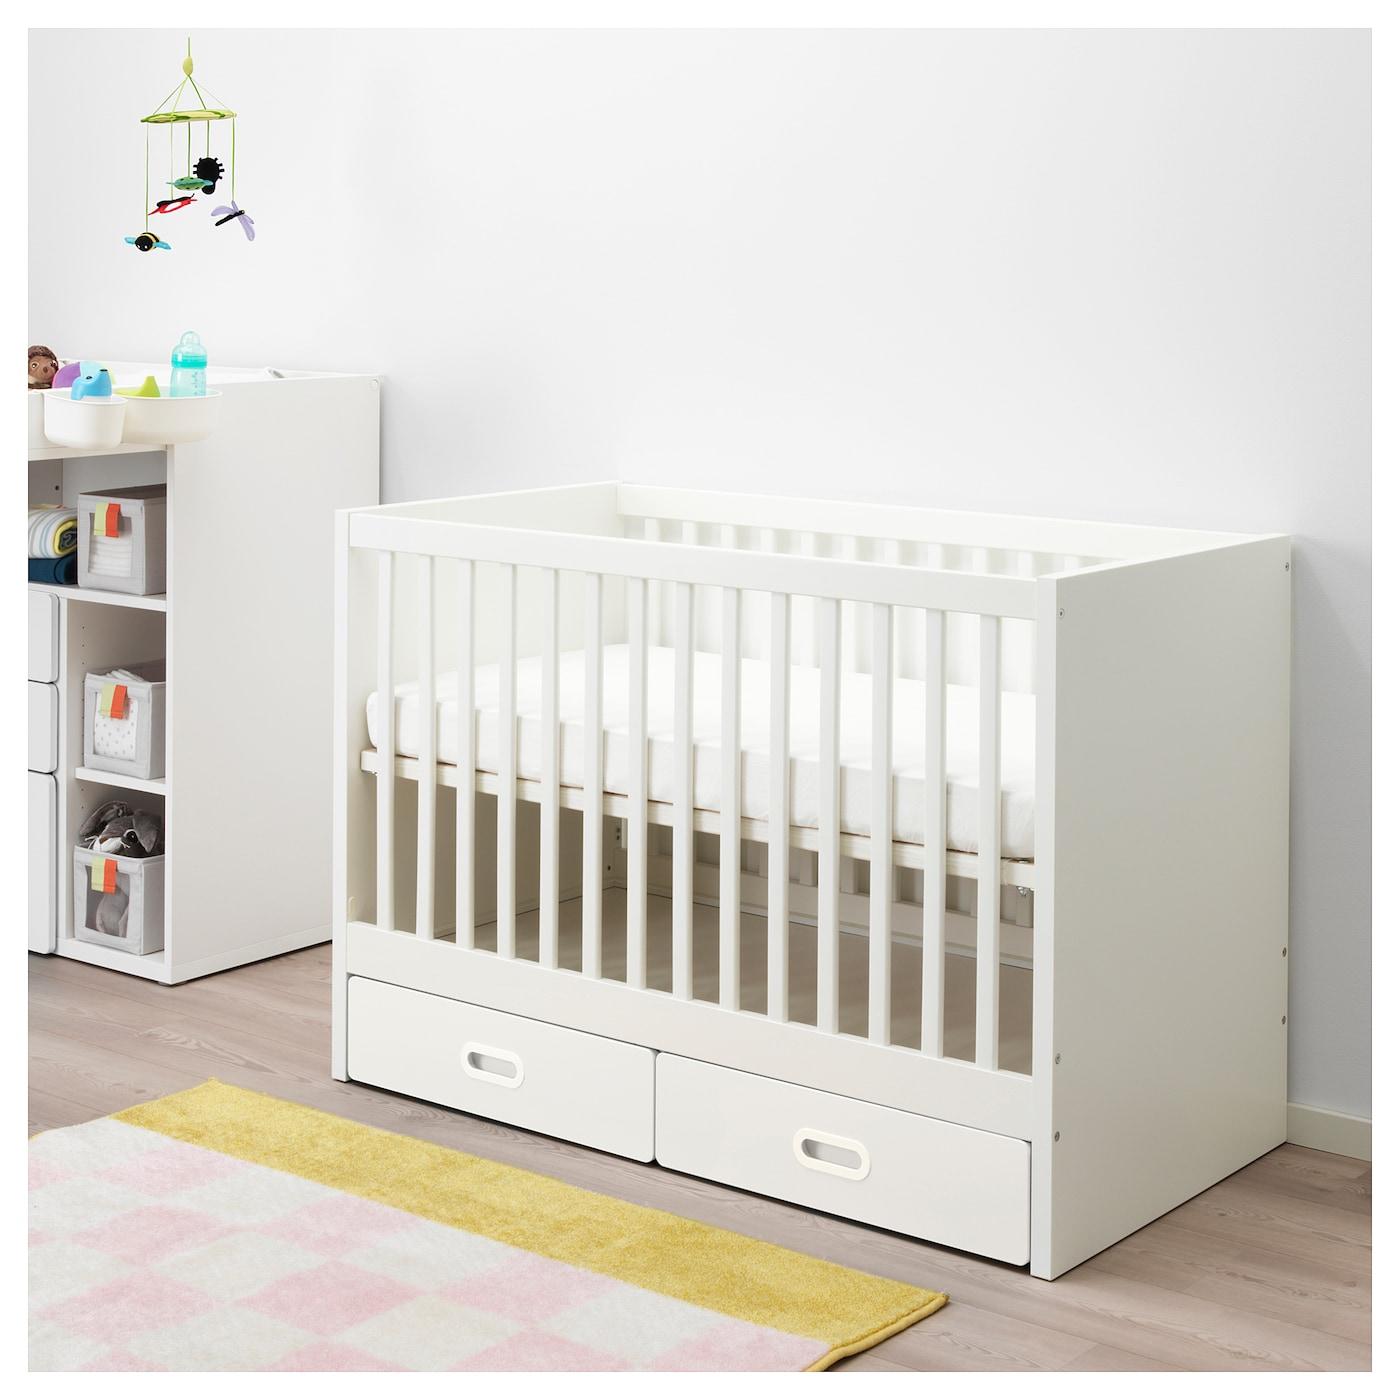 STUVA / FRITIDS babybedje met lades wit 126 cm 66 cm 86 cm 60 cm 120 cm 20 kg